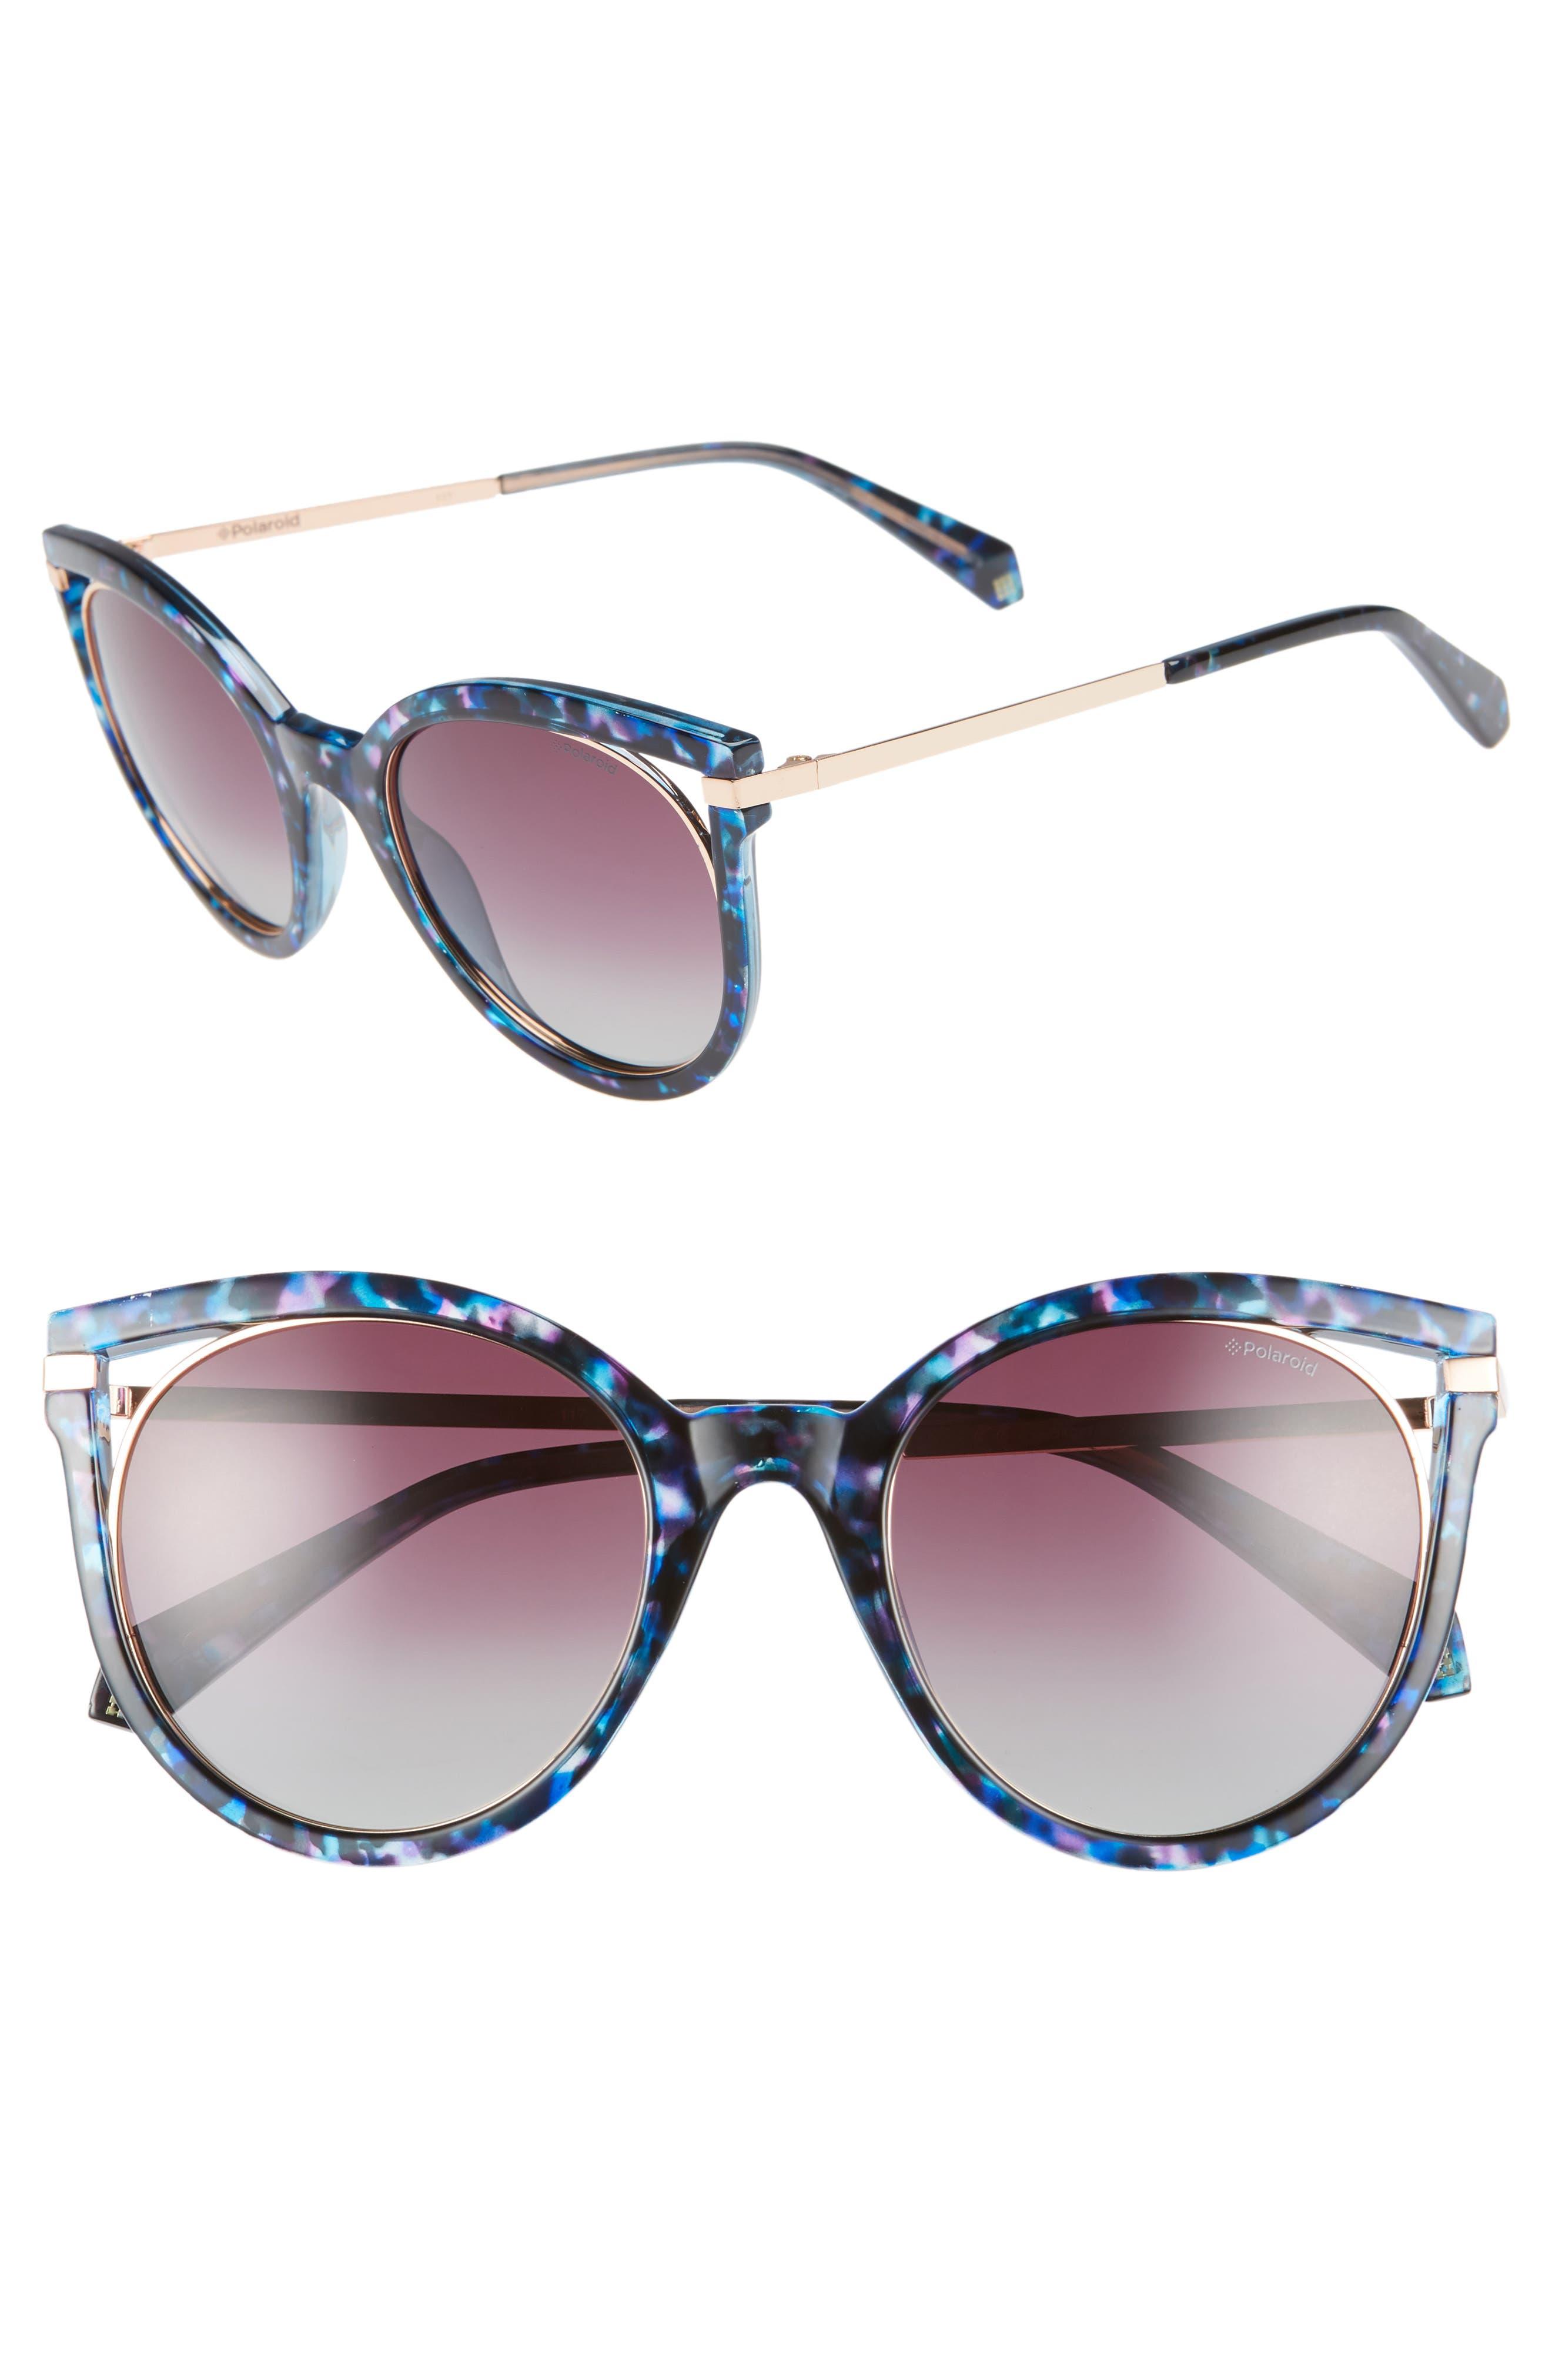 Polaroid 51Mm Cutout Polarized Cat Eye Sunglasses - Blue Havana